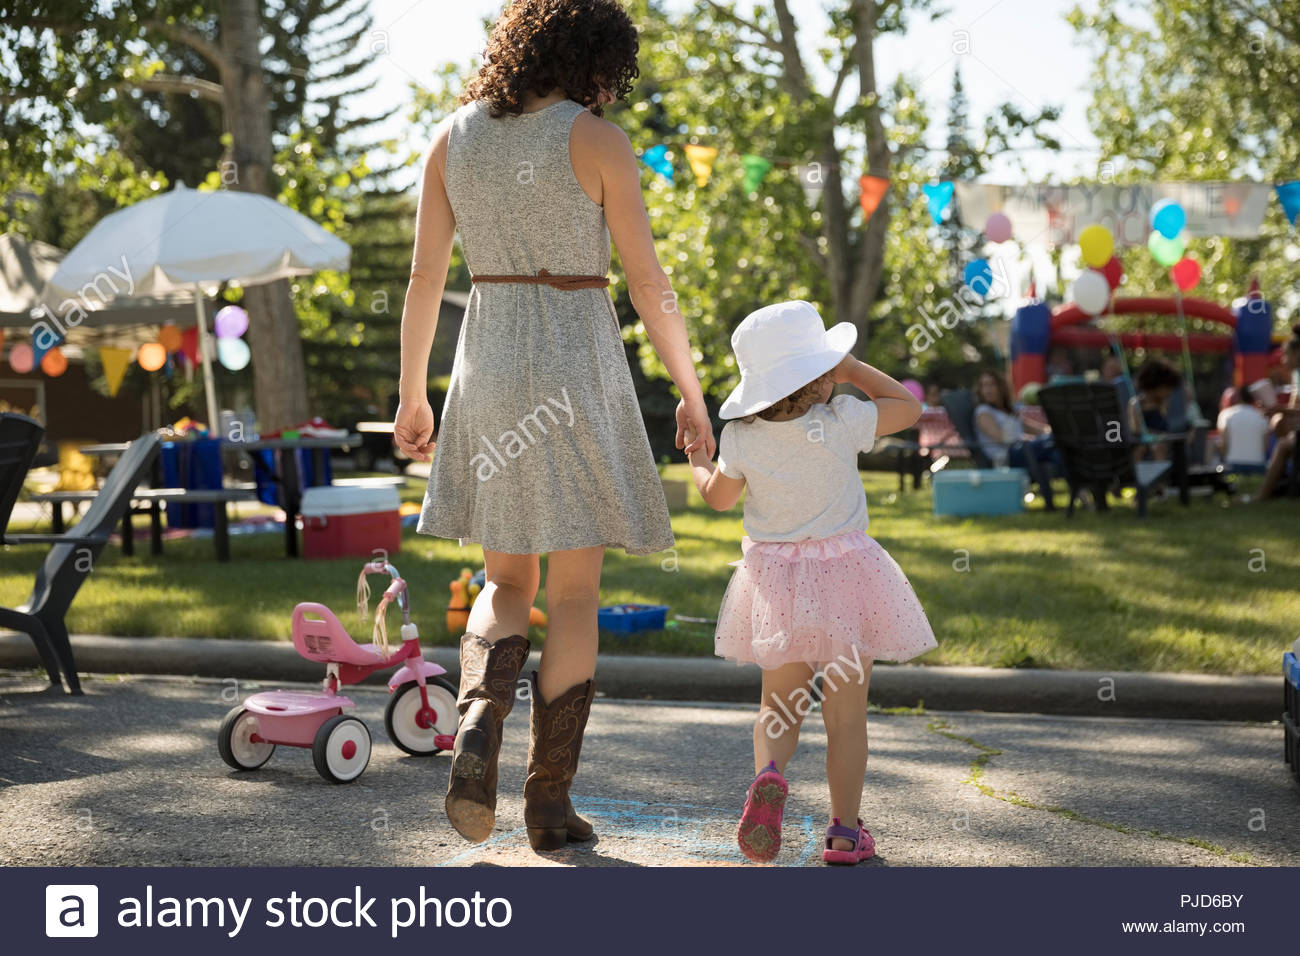 Mother and daughter walking toward summer neighborhood block party in park - Stock Image